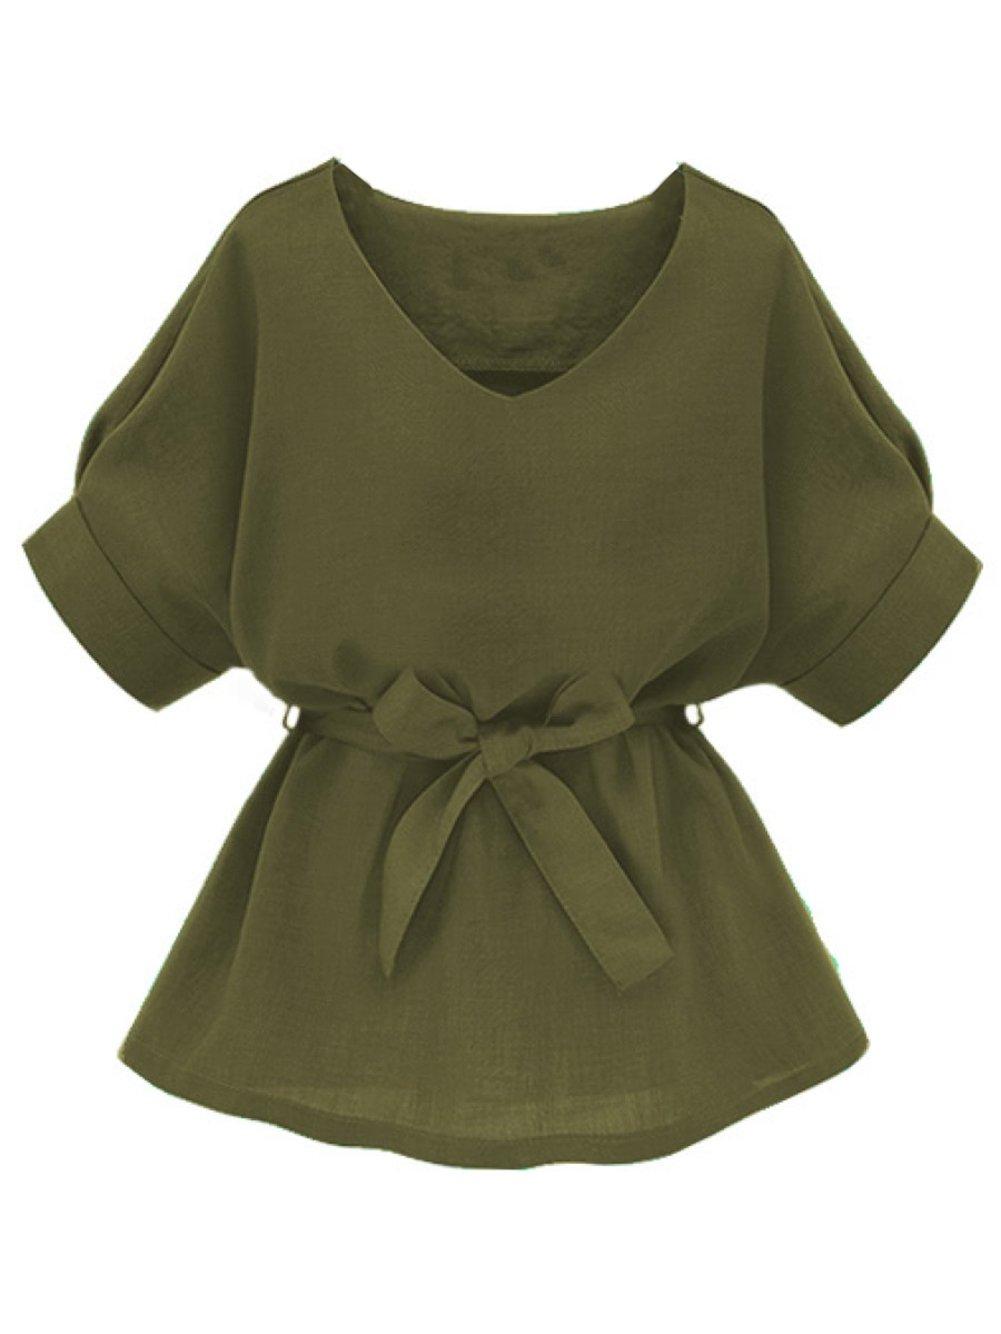 Milumia Womens V Neckline Self Tie Short Sleeve Blouse Tops Army Green Small